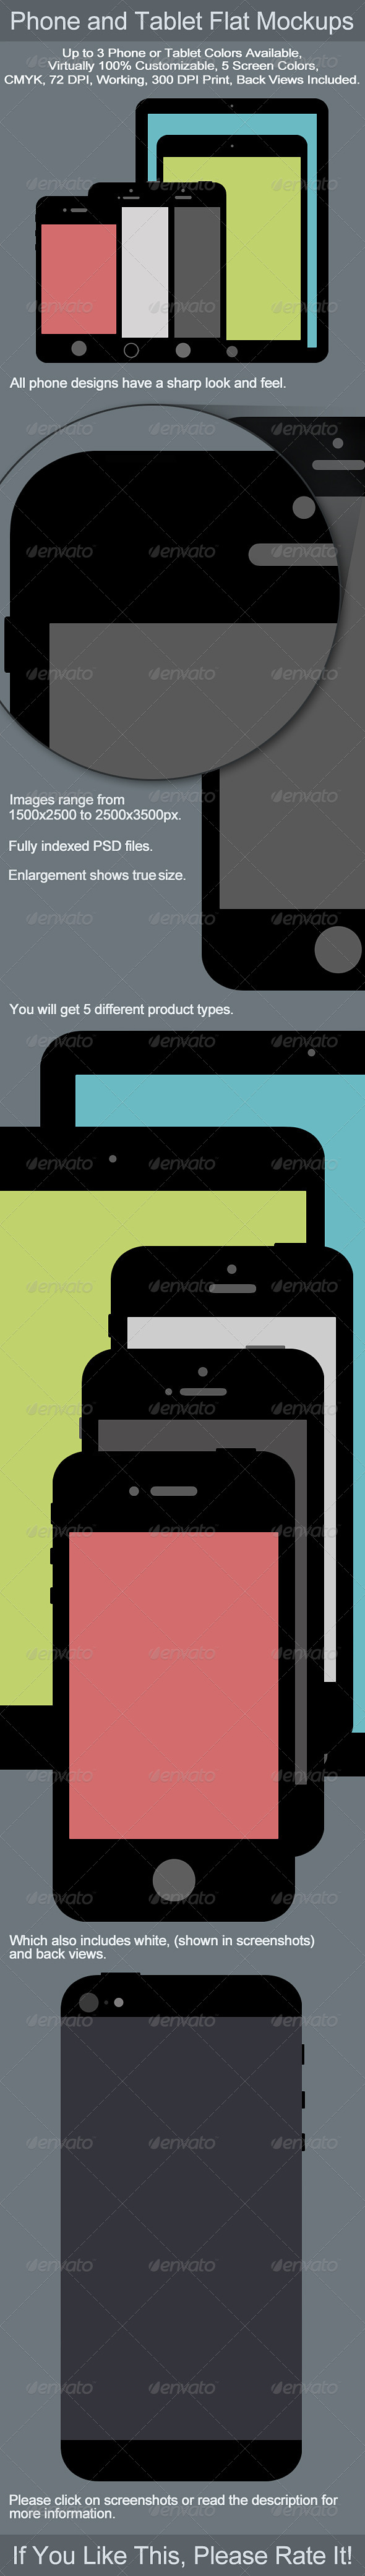 Phone and Tablet Flat Mockups - Mobile Displays